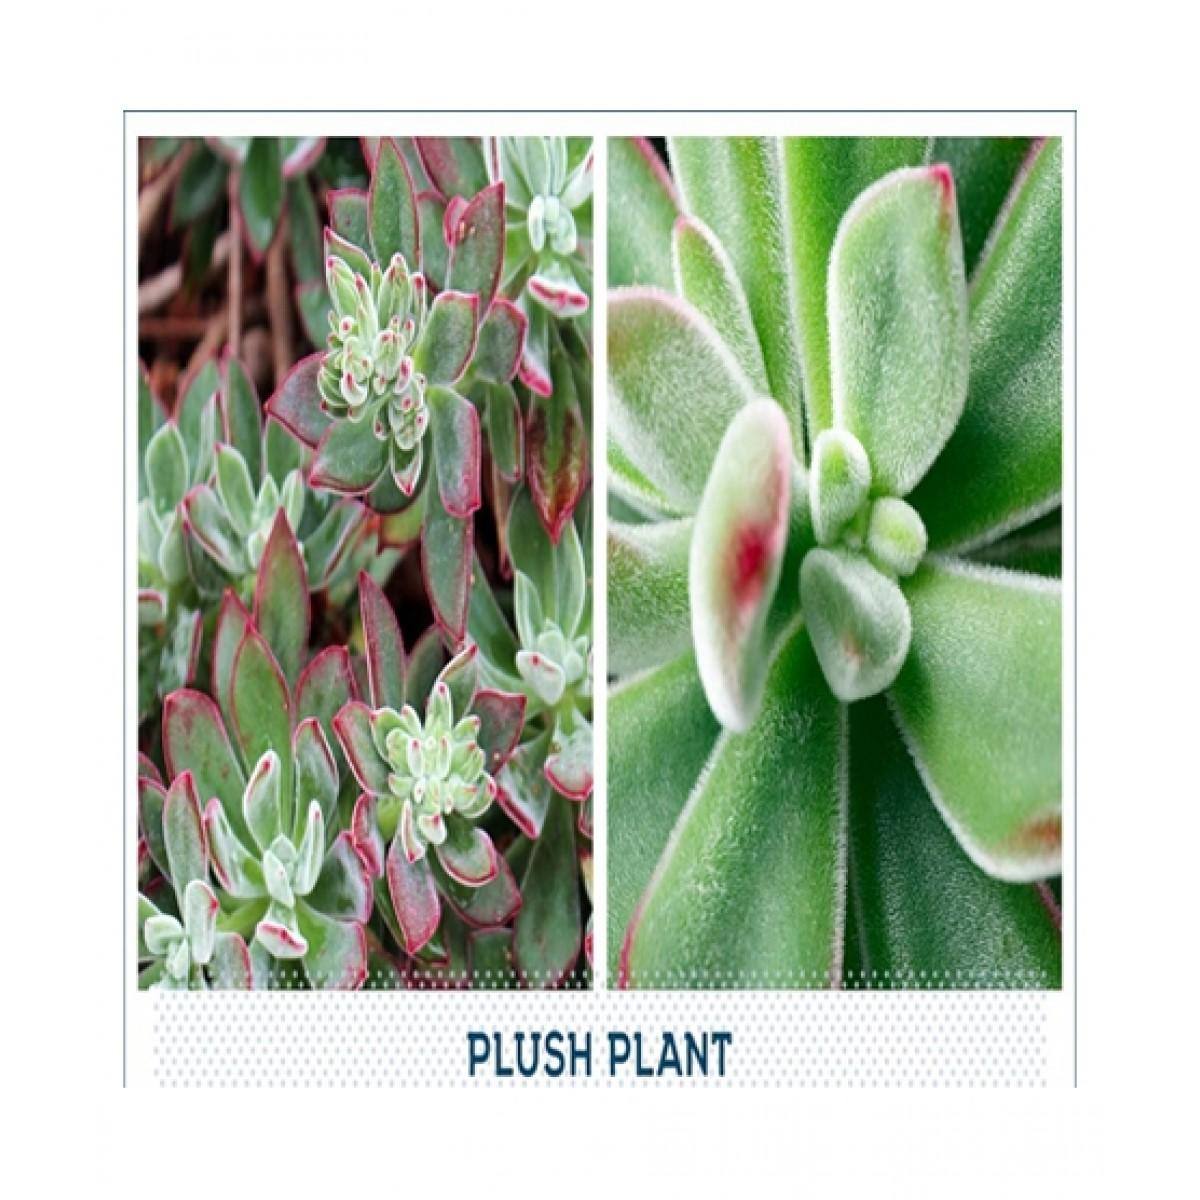 HusMah Plush Plant Succulent Seeds